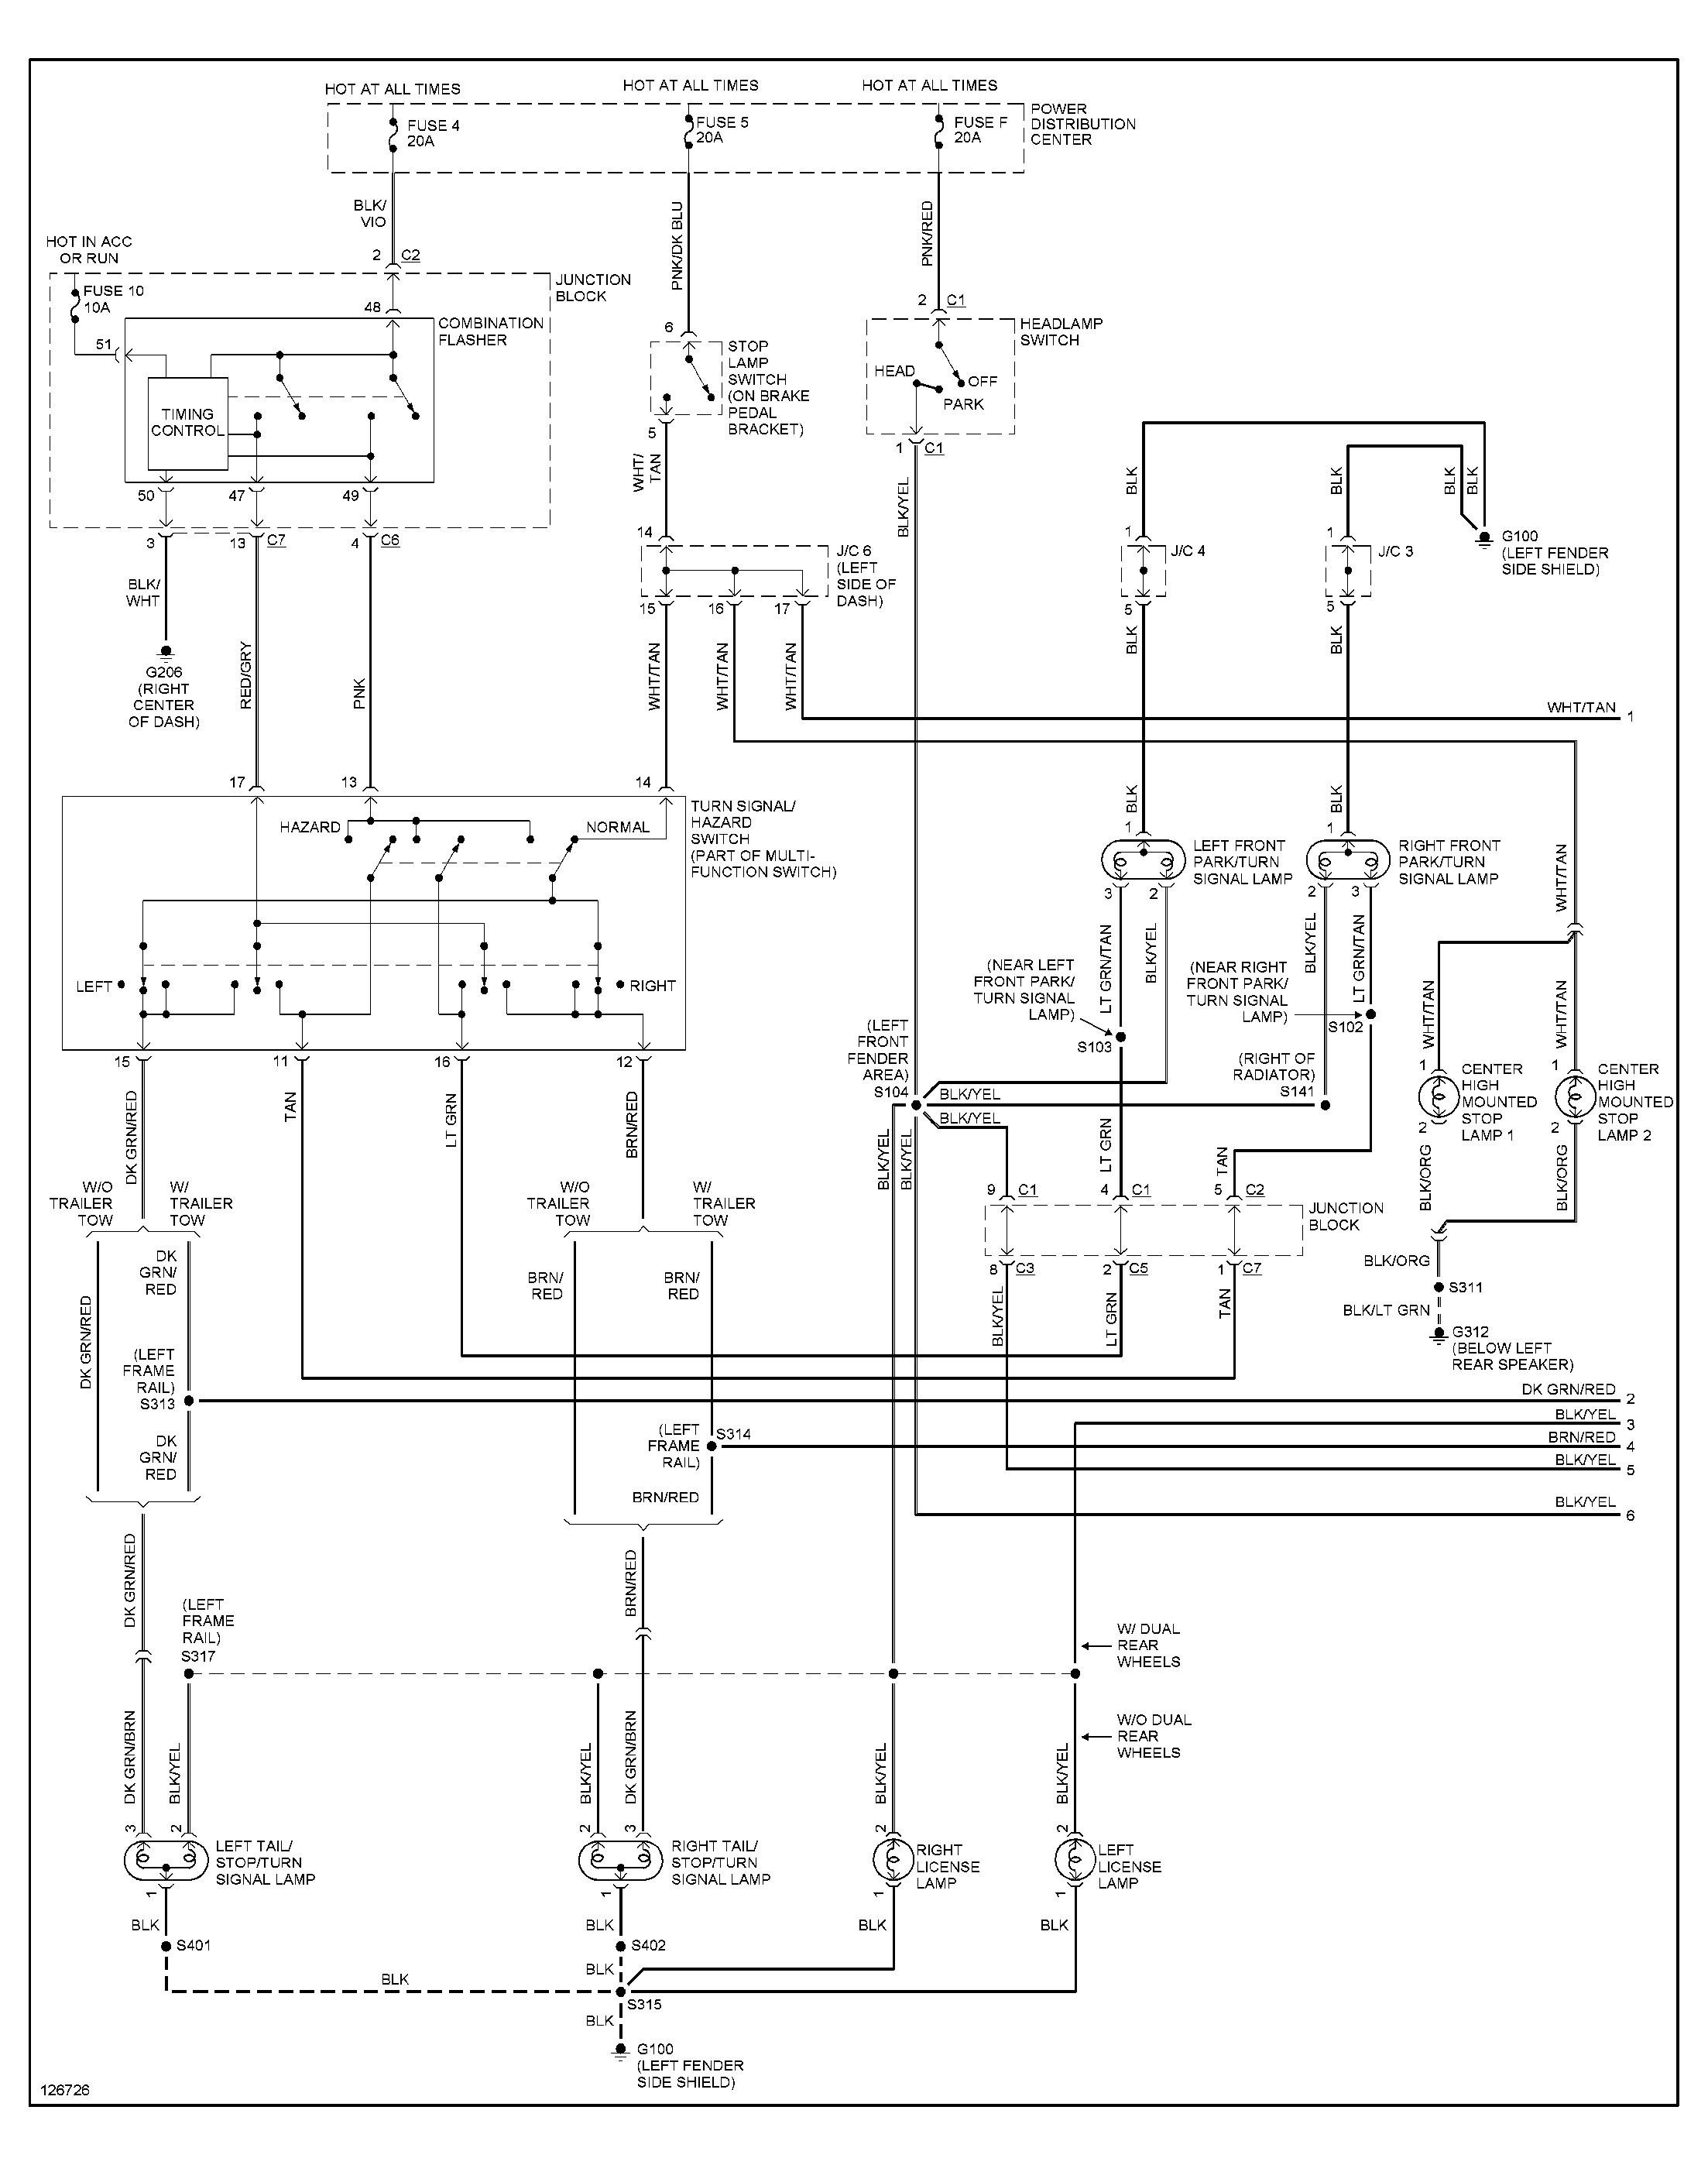 2002 Dodge Ram 1500 Wiring Diagram 2002 Dodge Ram 1500 Tail Light Wiring Diagram Zookastar Of 2002 Dodge Ram 1500 Wiring Diagram